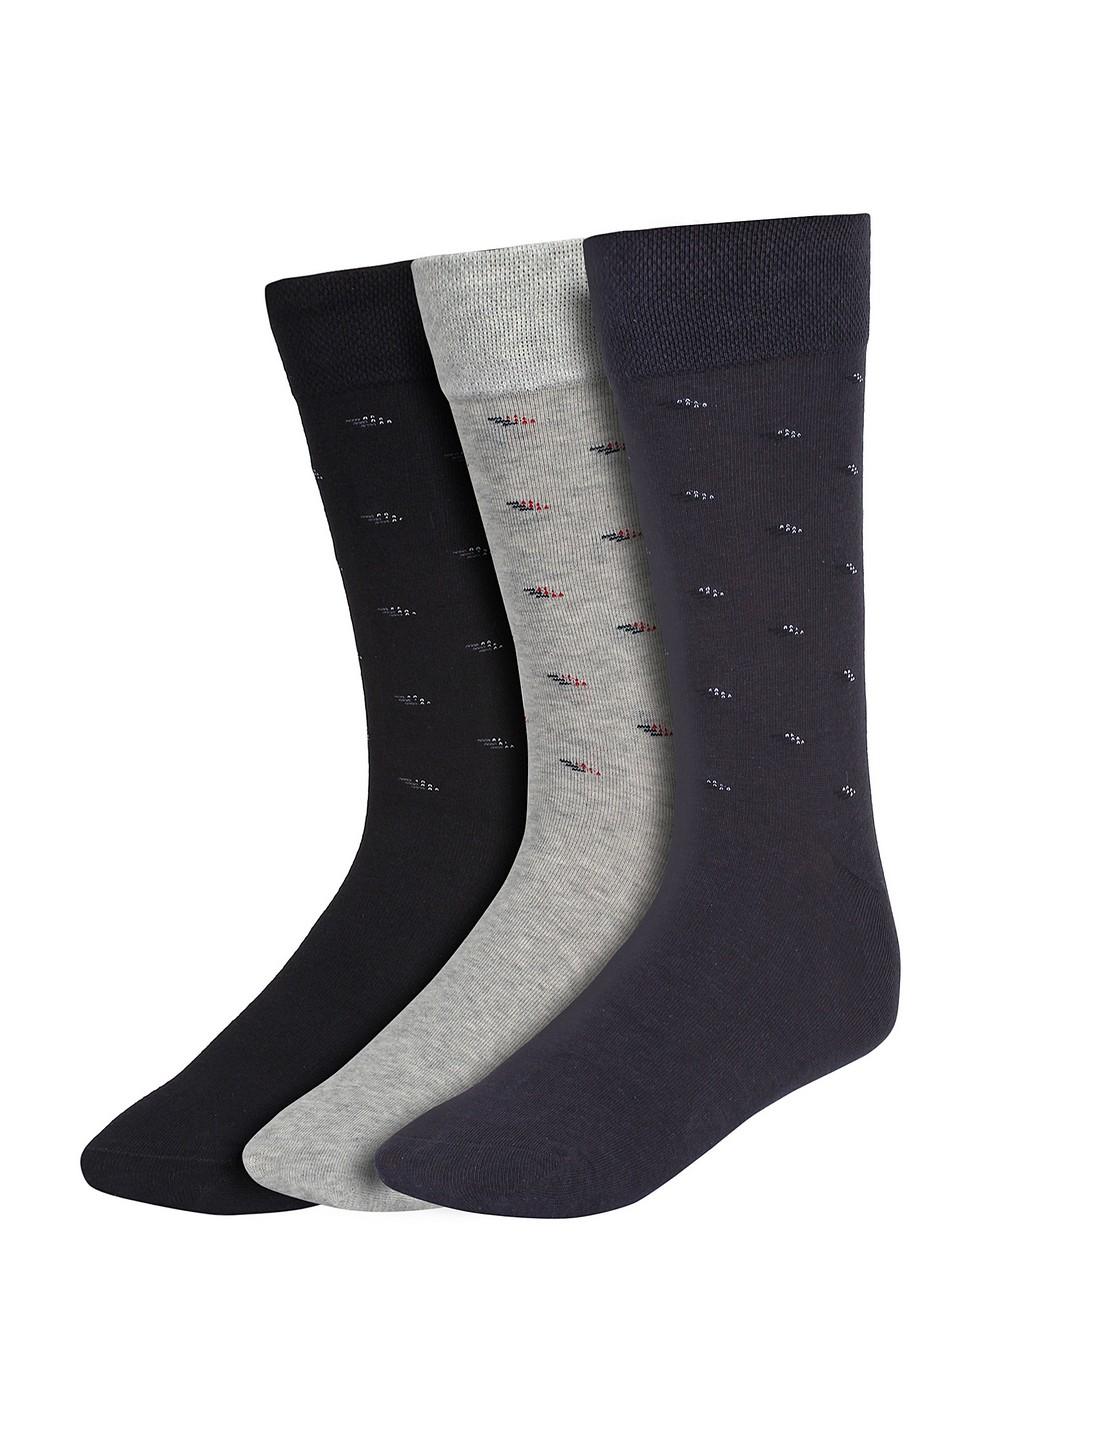 CREATURE | CREATURE Men's Cotton Calf Length Formal Socks Combo of 3